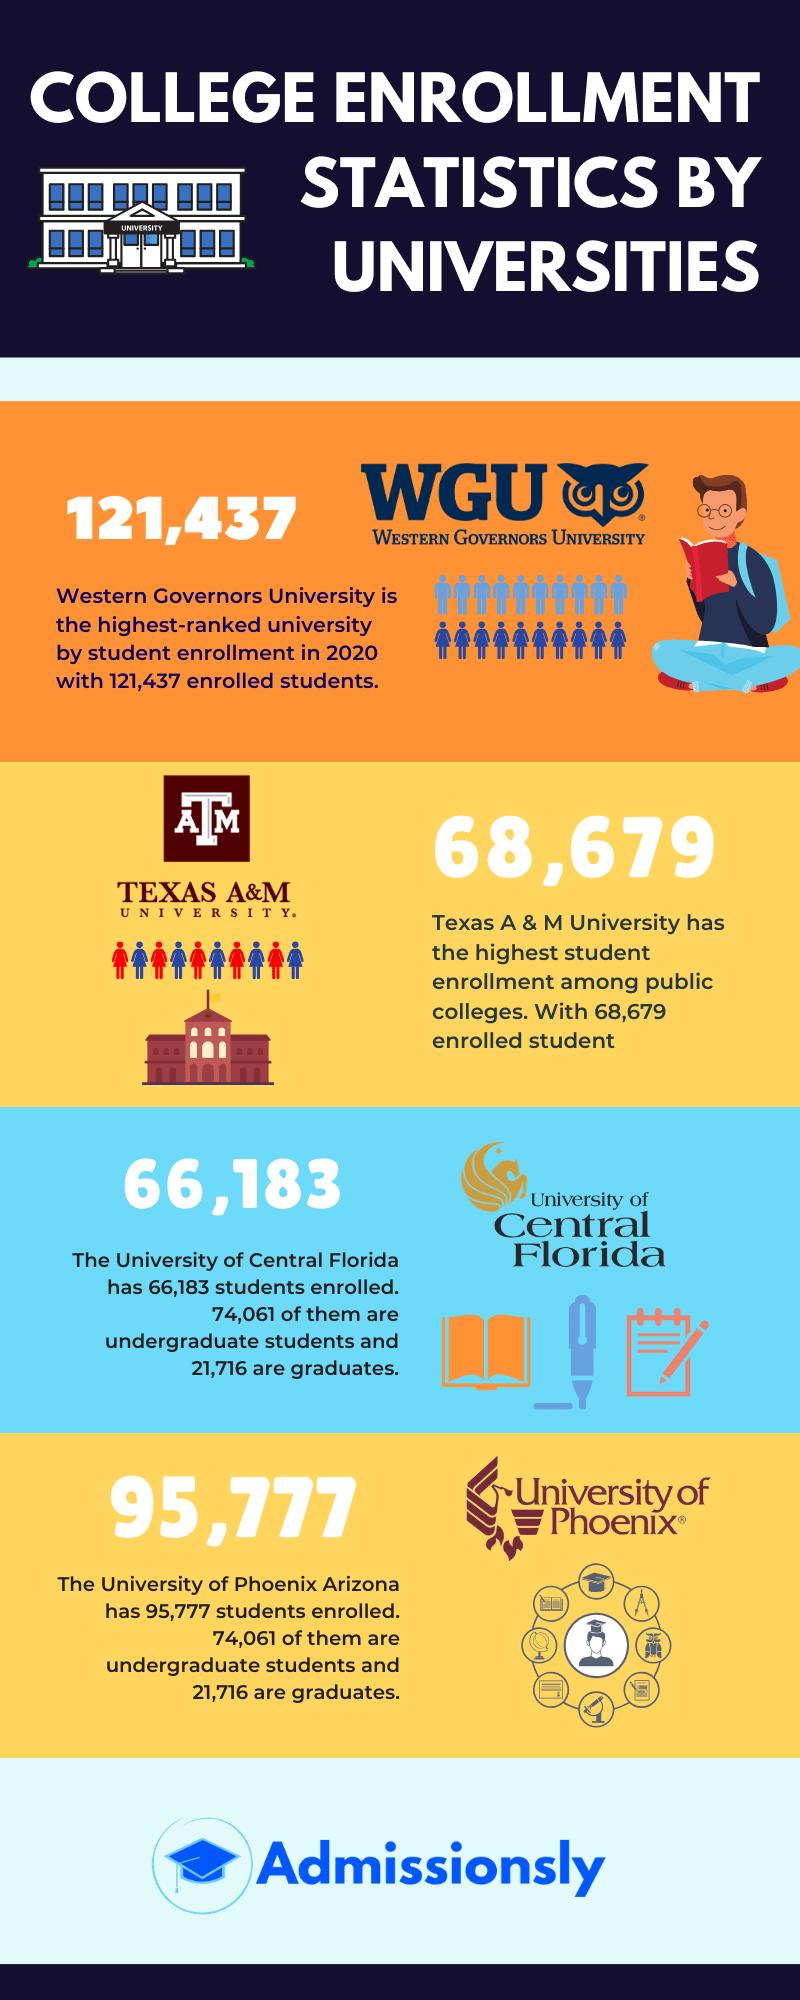 College Enrollment Statistics 2020